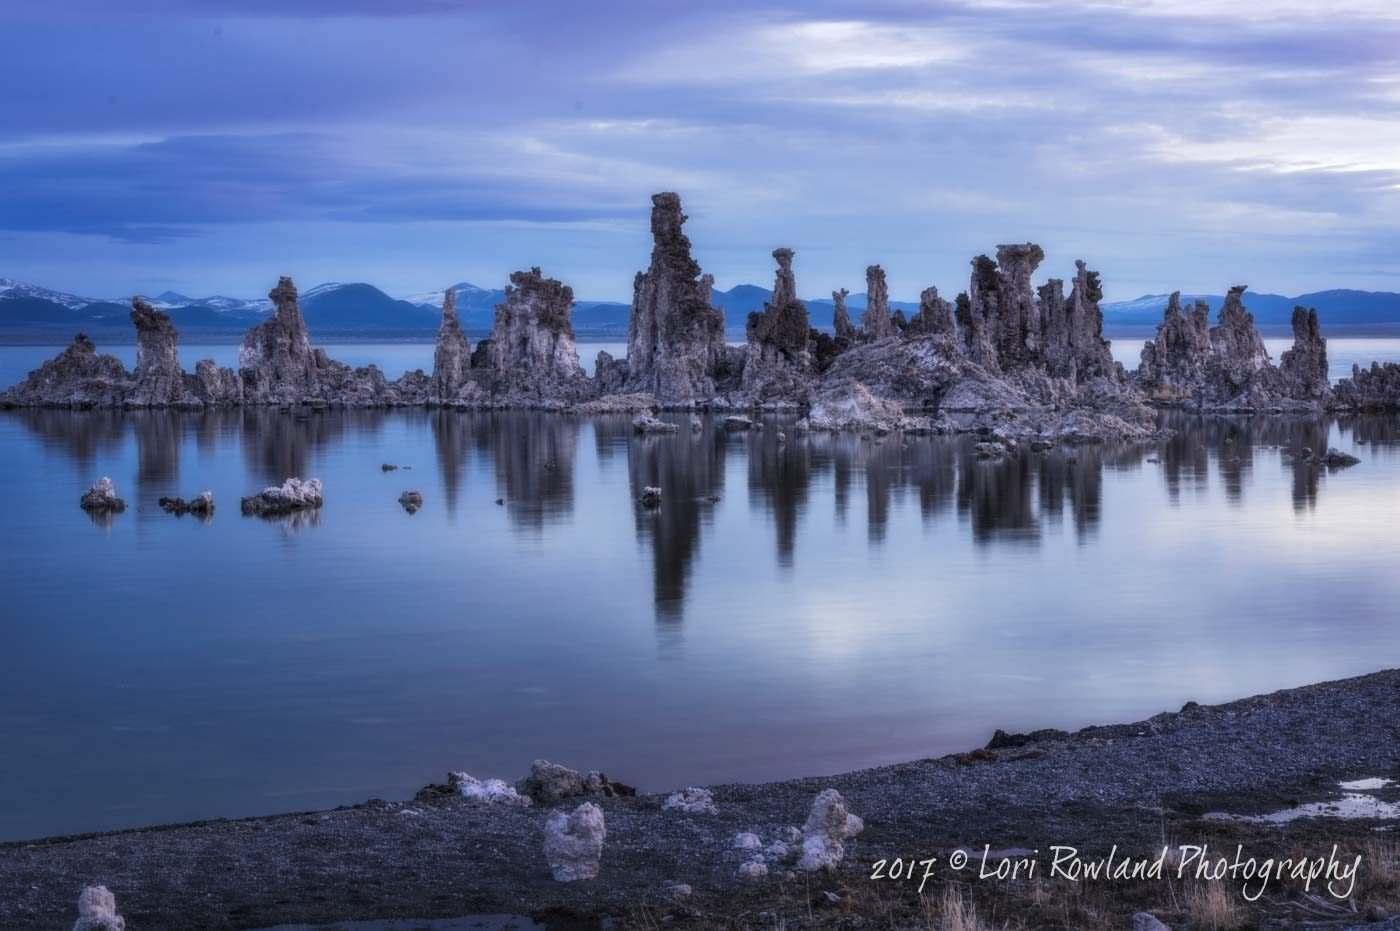 Early morning reflections of Tufa at Mono Lake, California